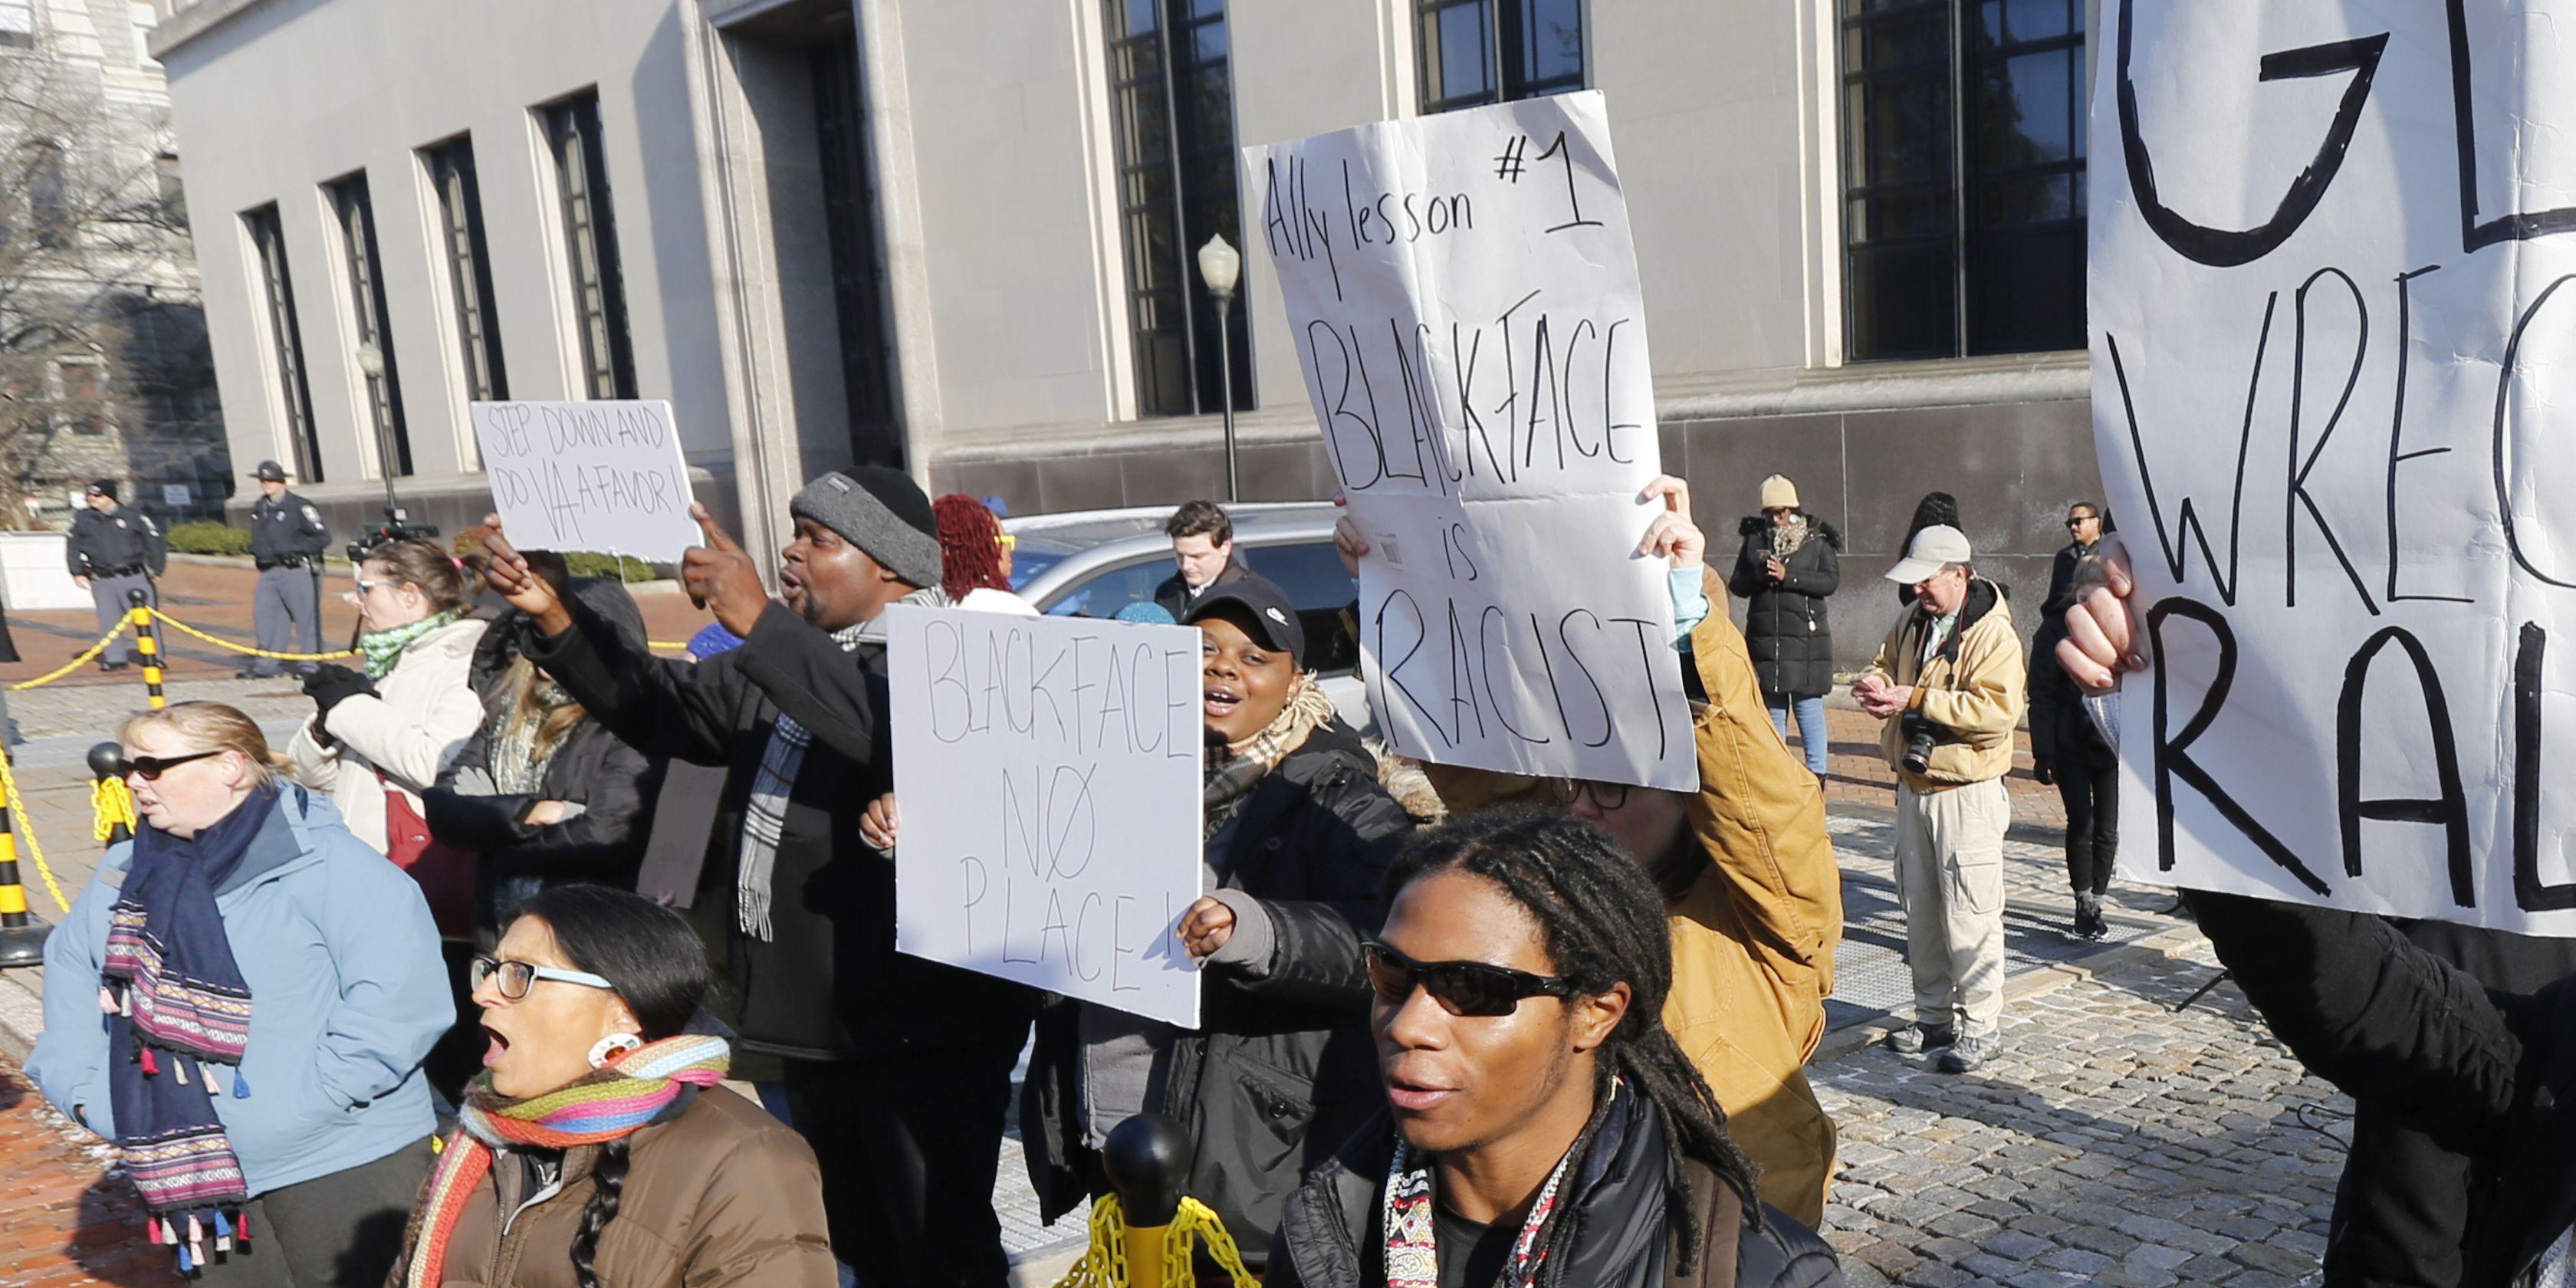 Blackface scandal spotlights deeply embedded racism in US